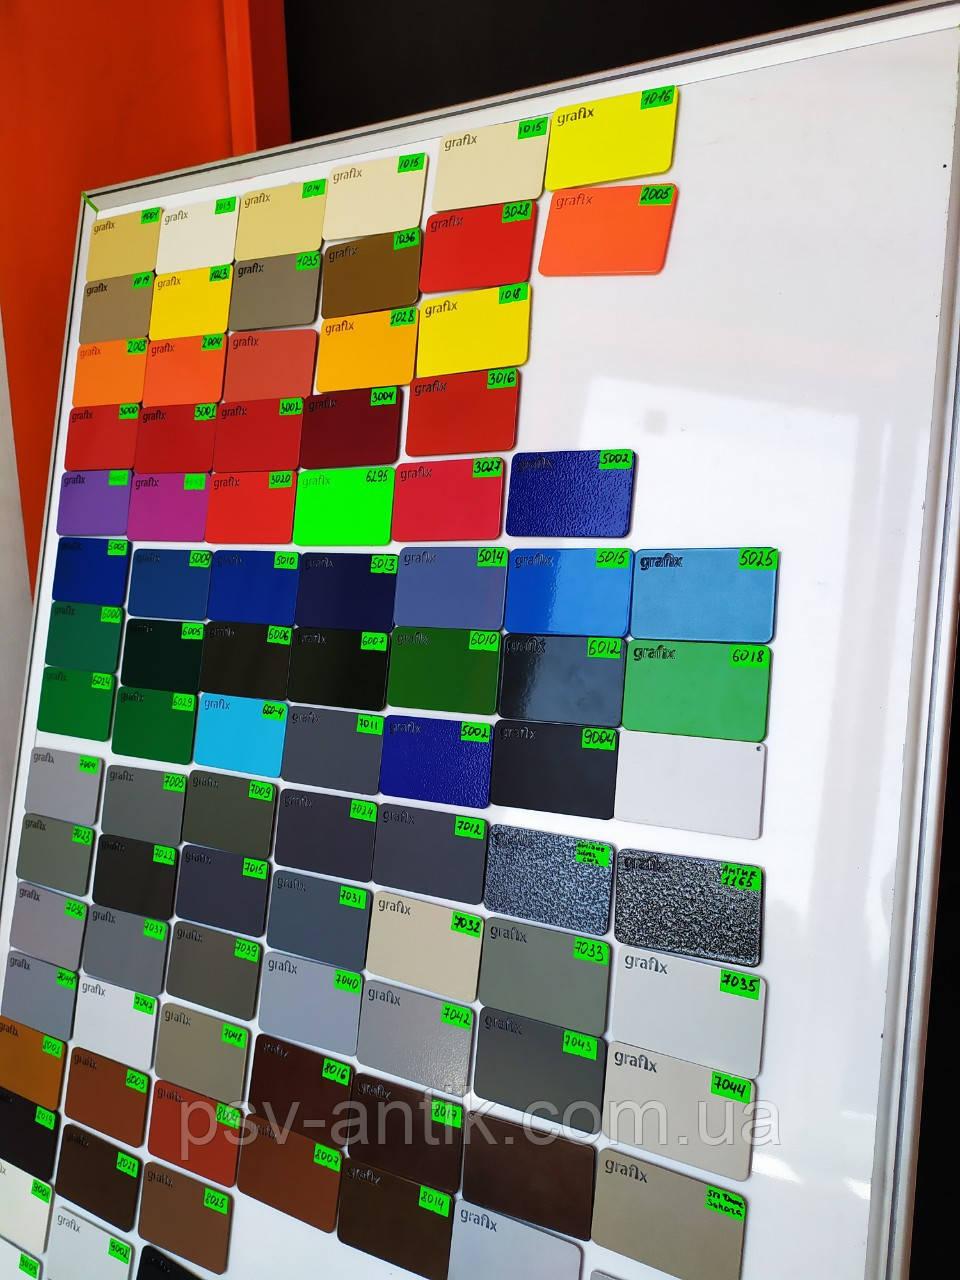 Порошковая краска глянцевая, полиэфирная, архитектурная, 3005